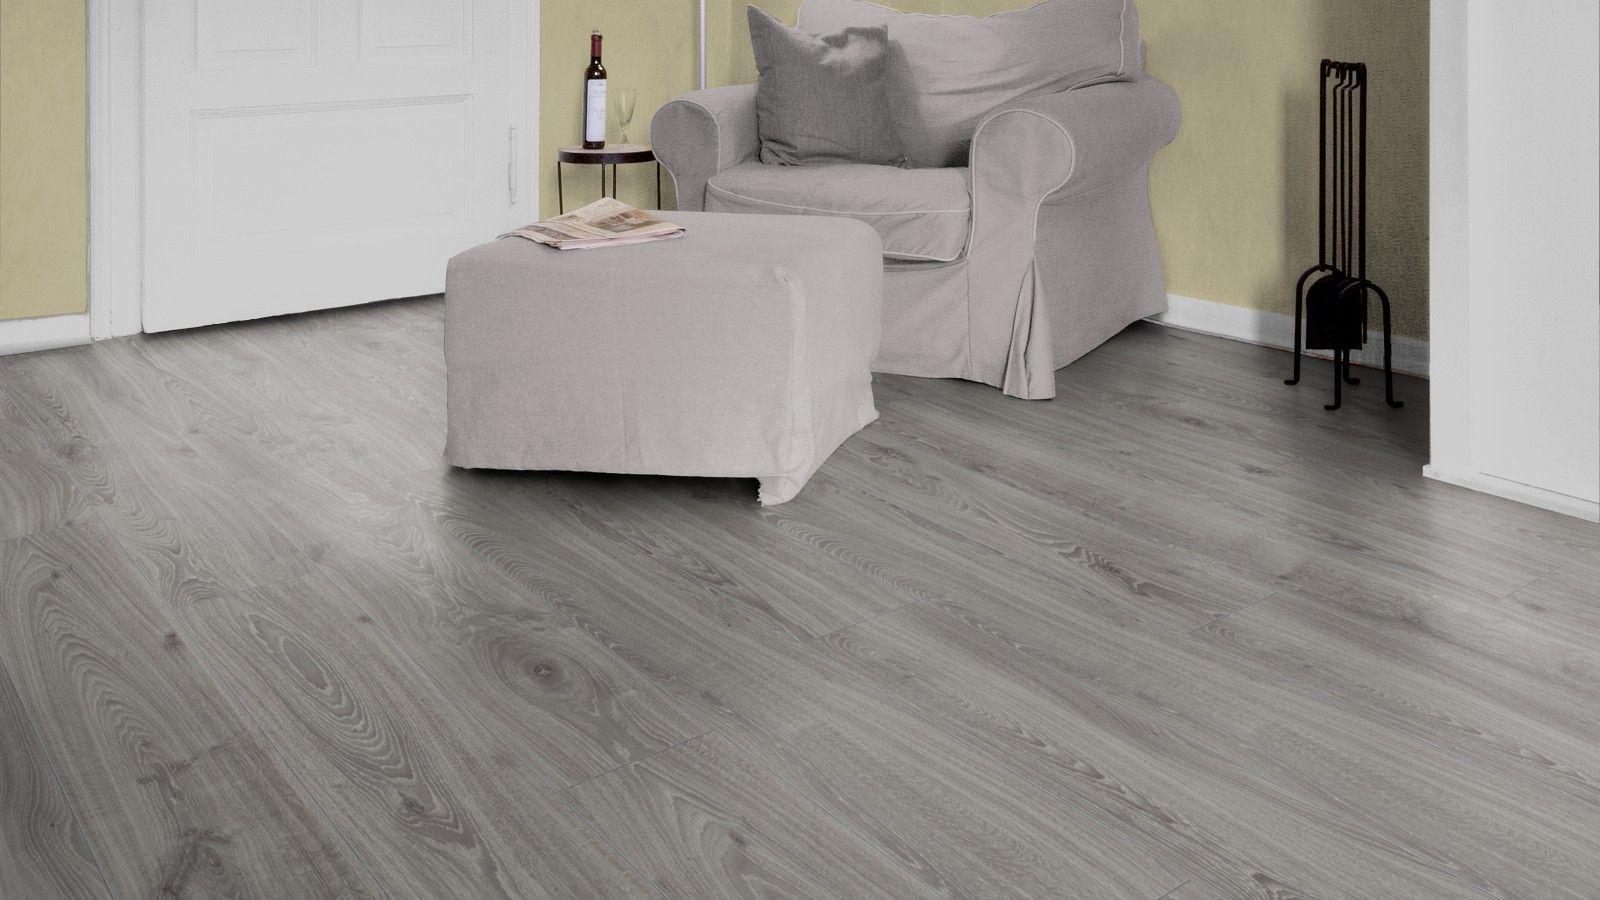 Wood Flooring Ireland - Handmade Timber Flooring - Cork